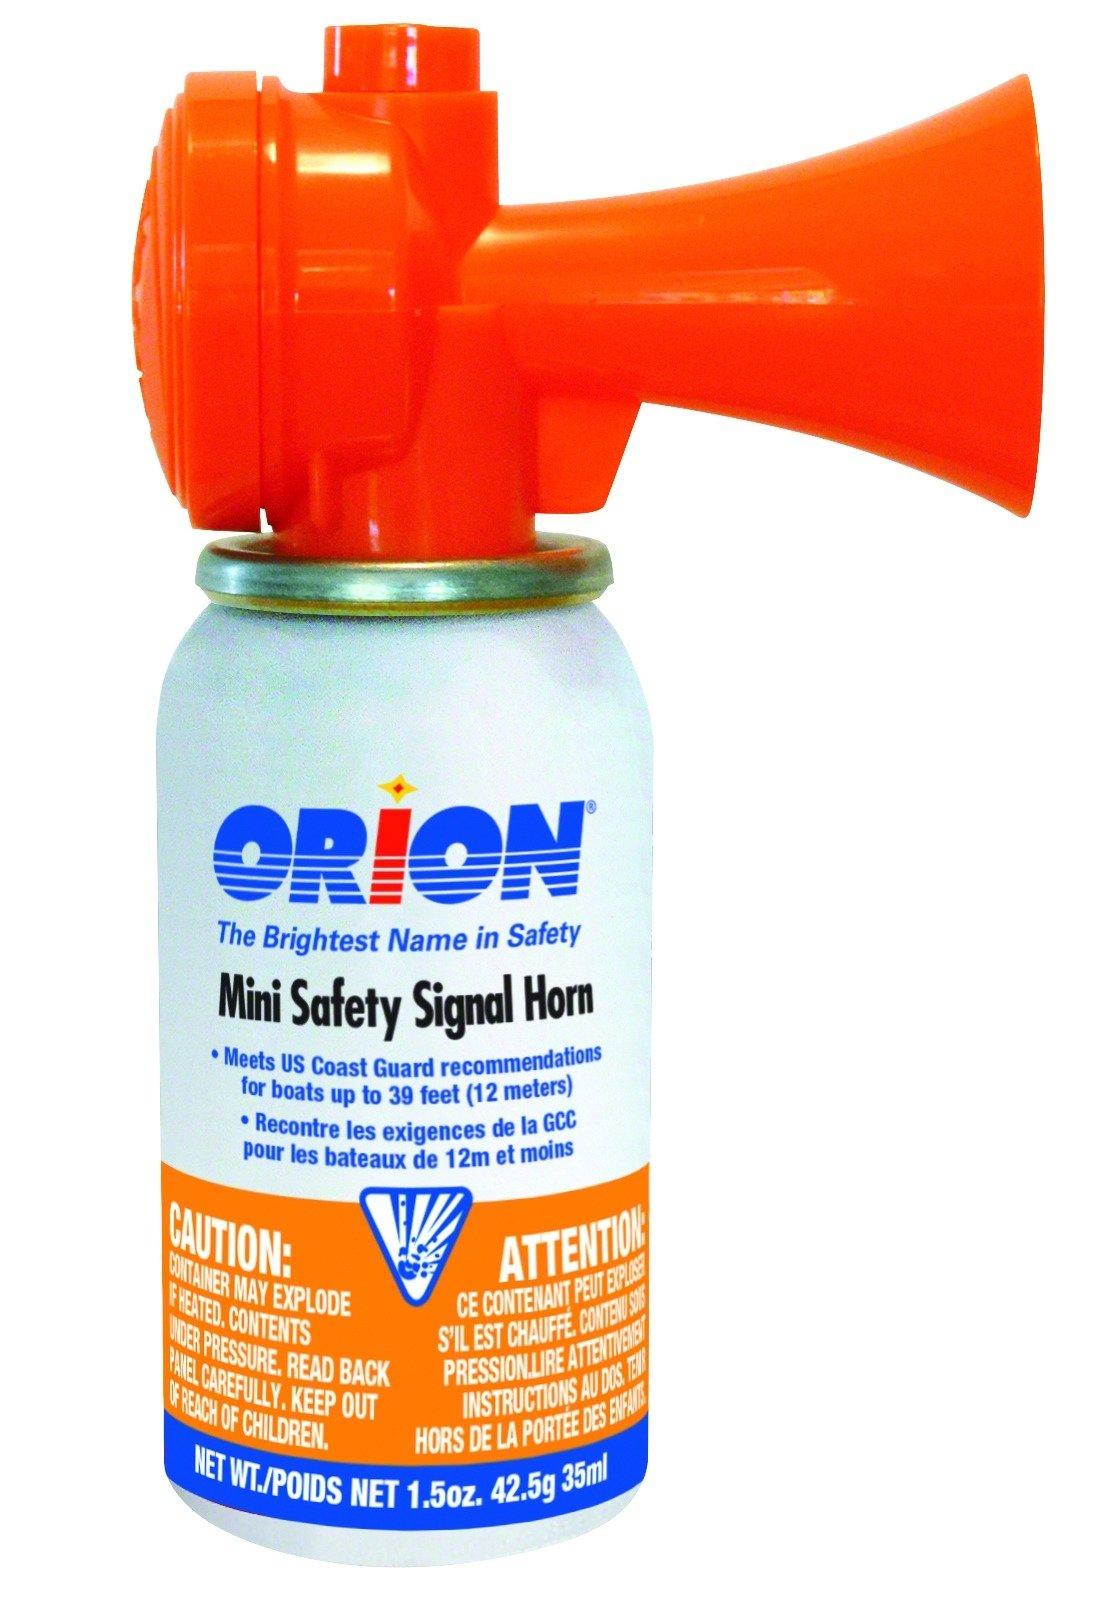 Opti-2 Orion 508 Safety 1.5 oz Air Horn